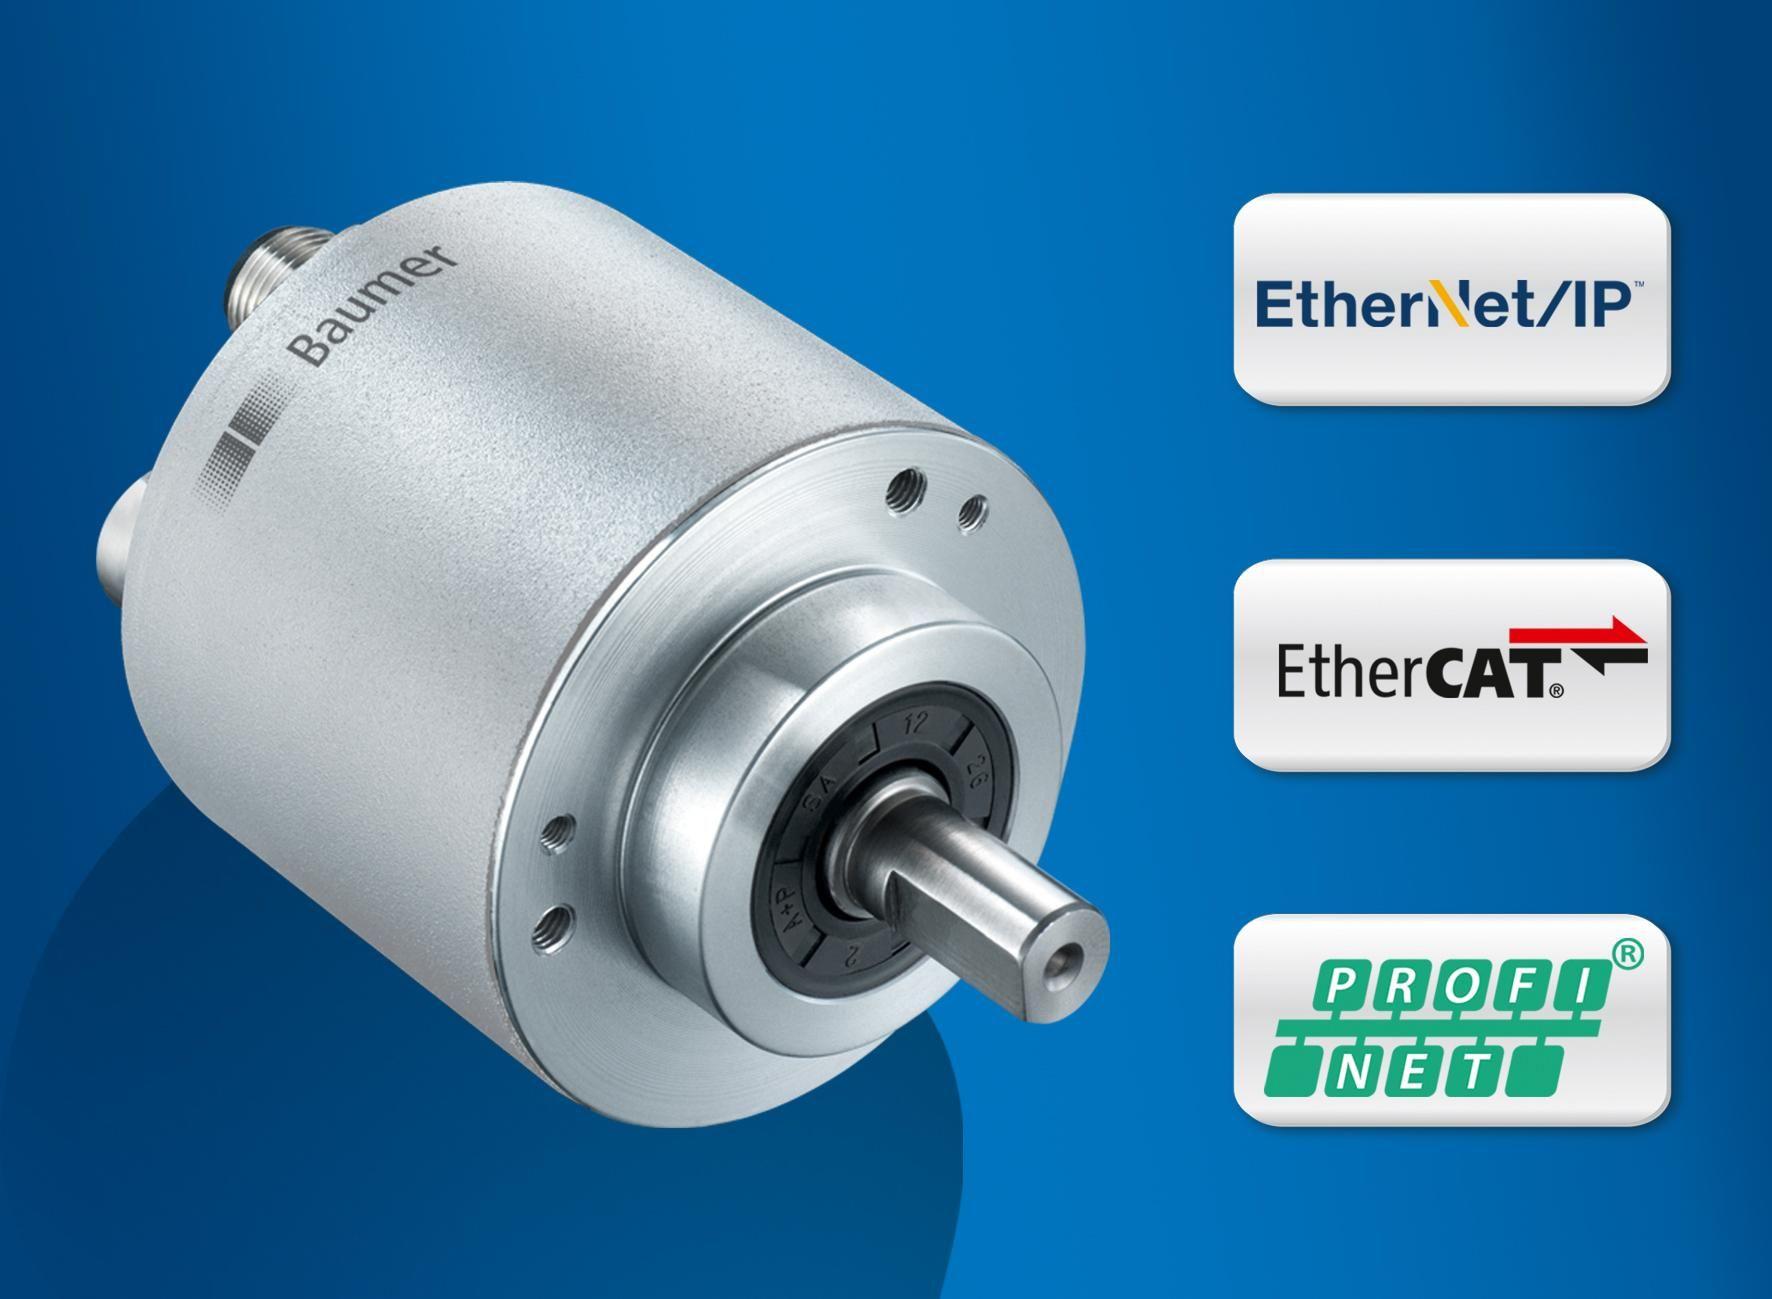 Baumer magnetic encoders: Precise, robust and enhancing efficiency